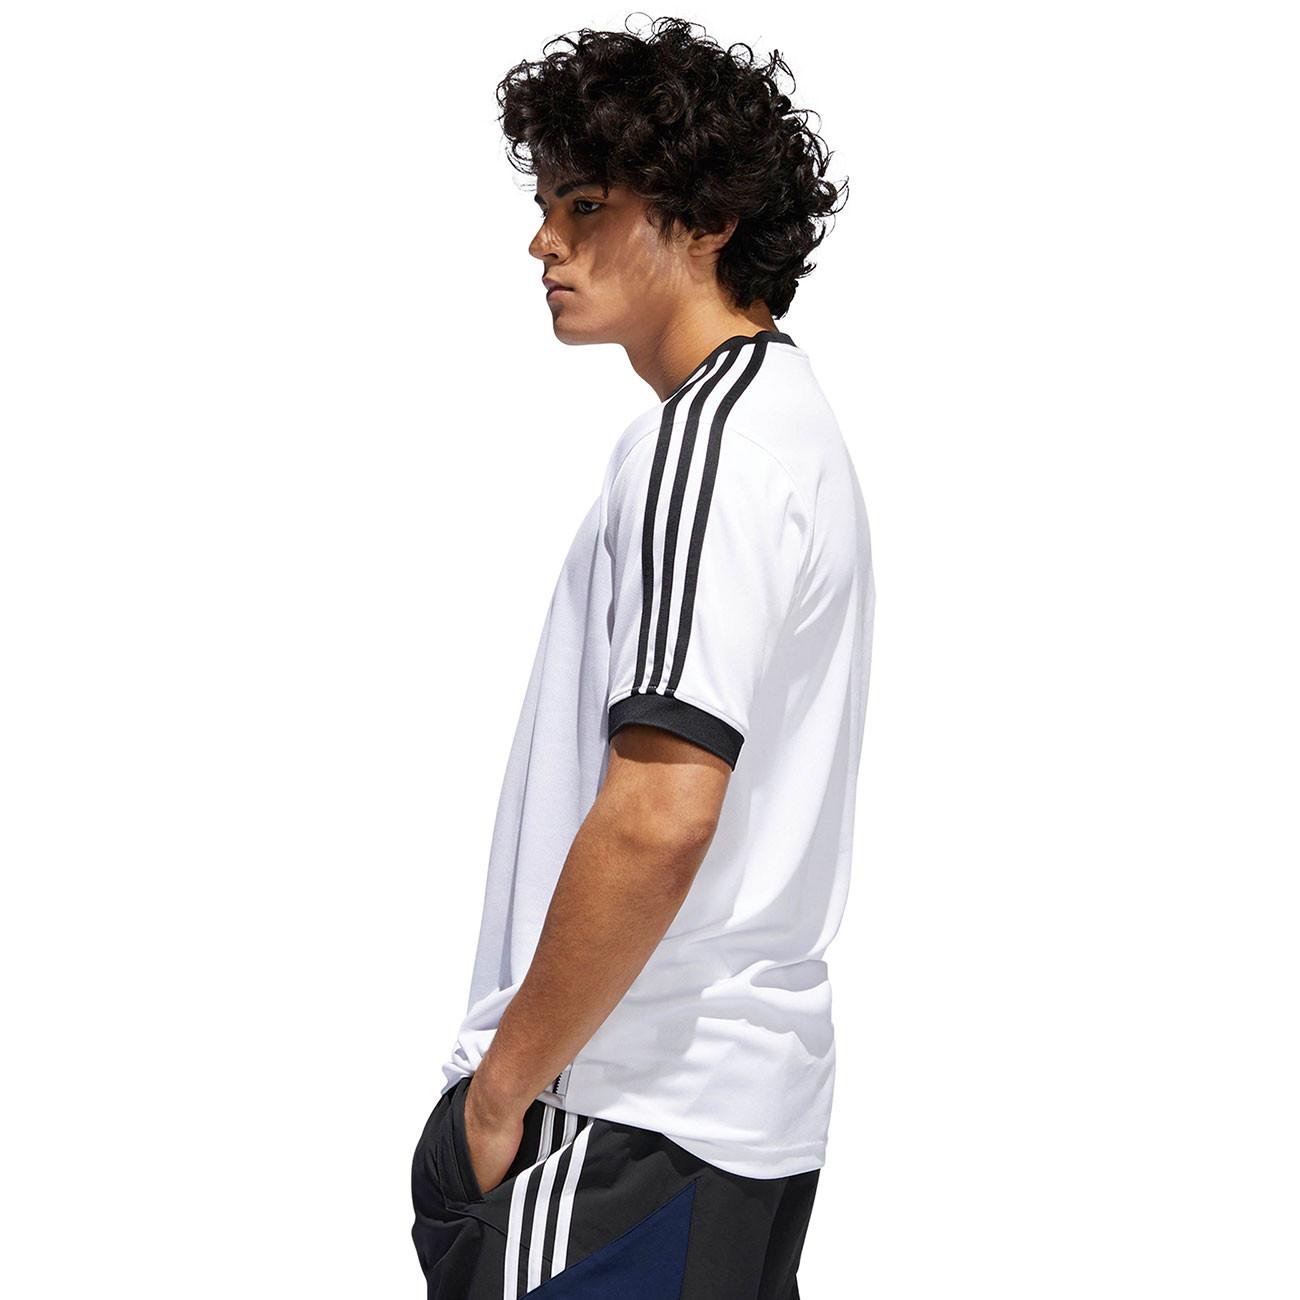 a4c4935bef Tričko Adidas Club Jersey white black